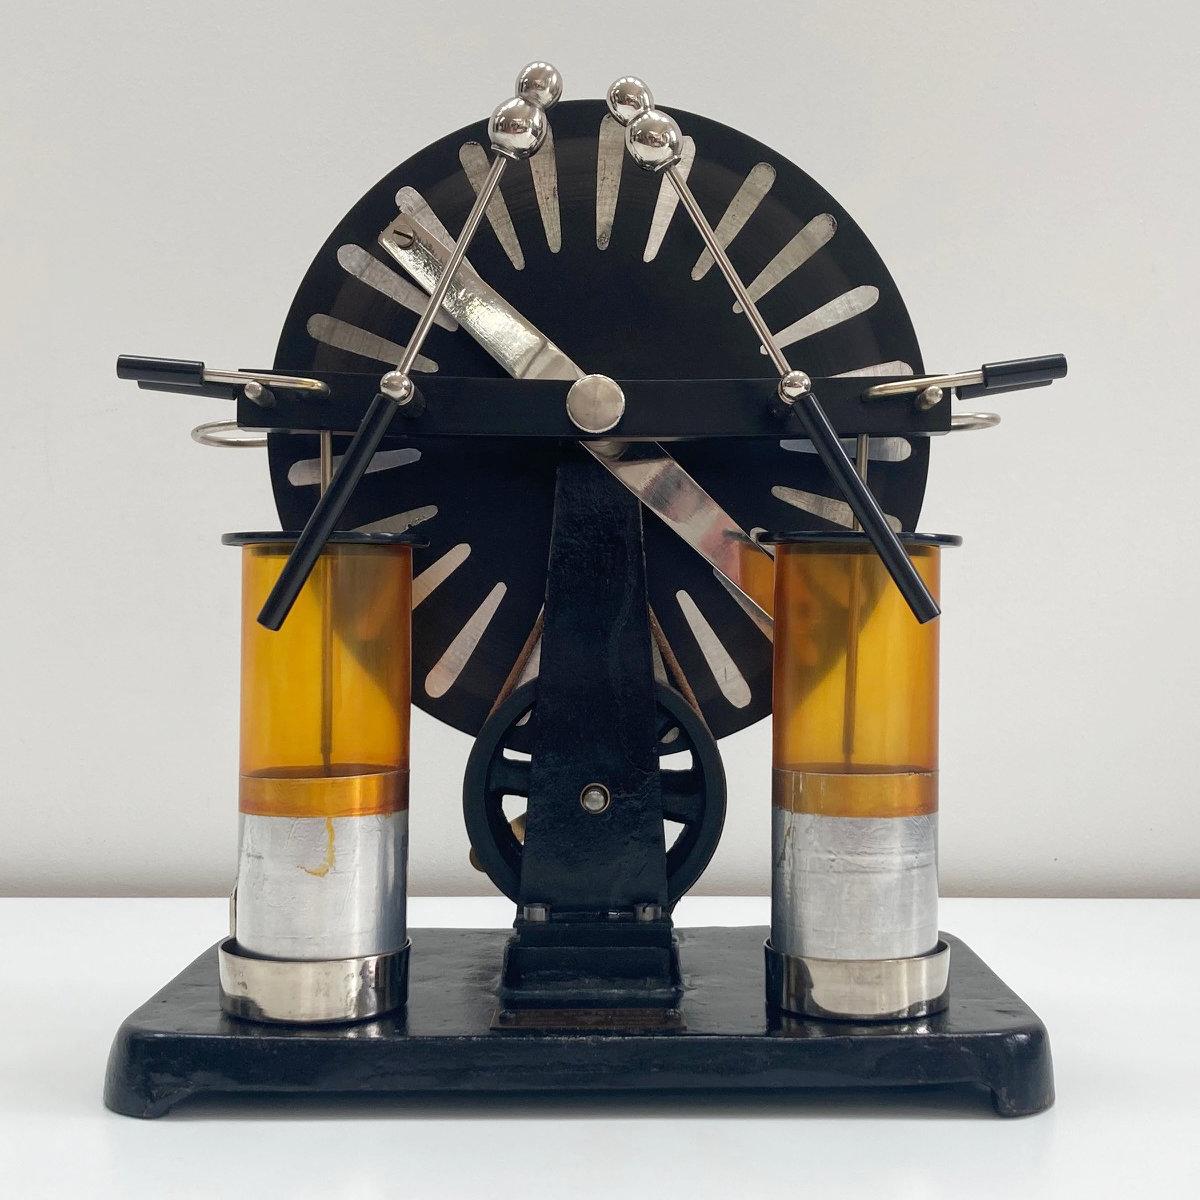 Early Twentieth Century Wimshurst Machine by Baird & Tatlock